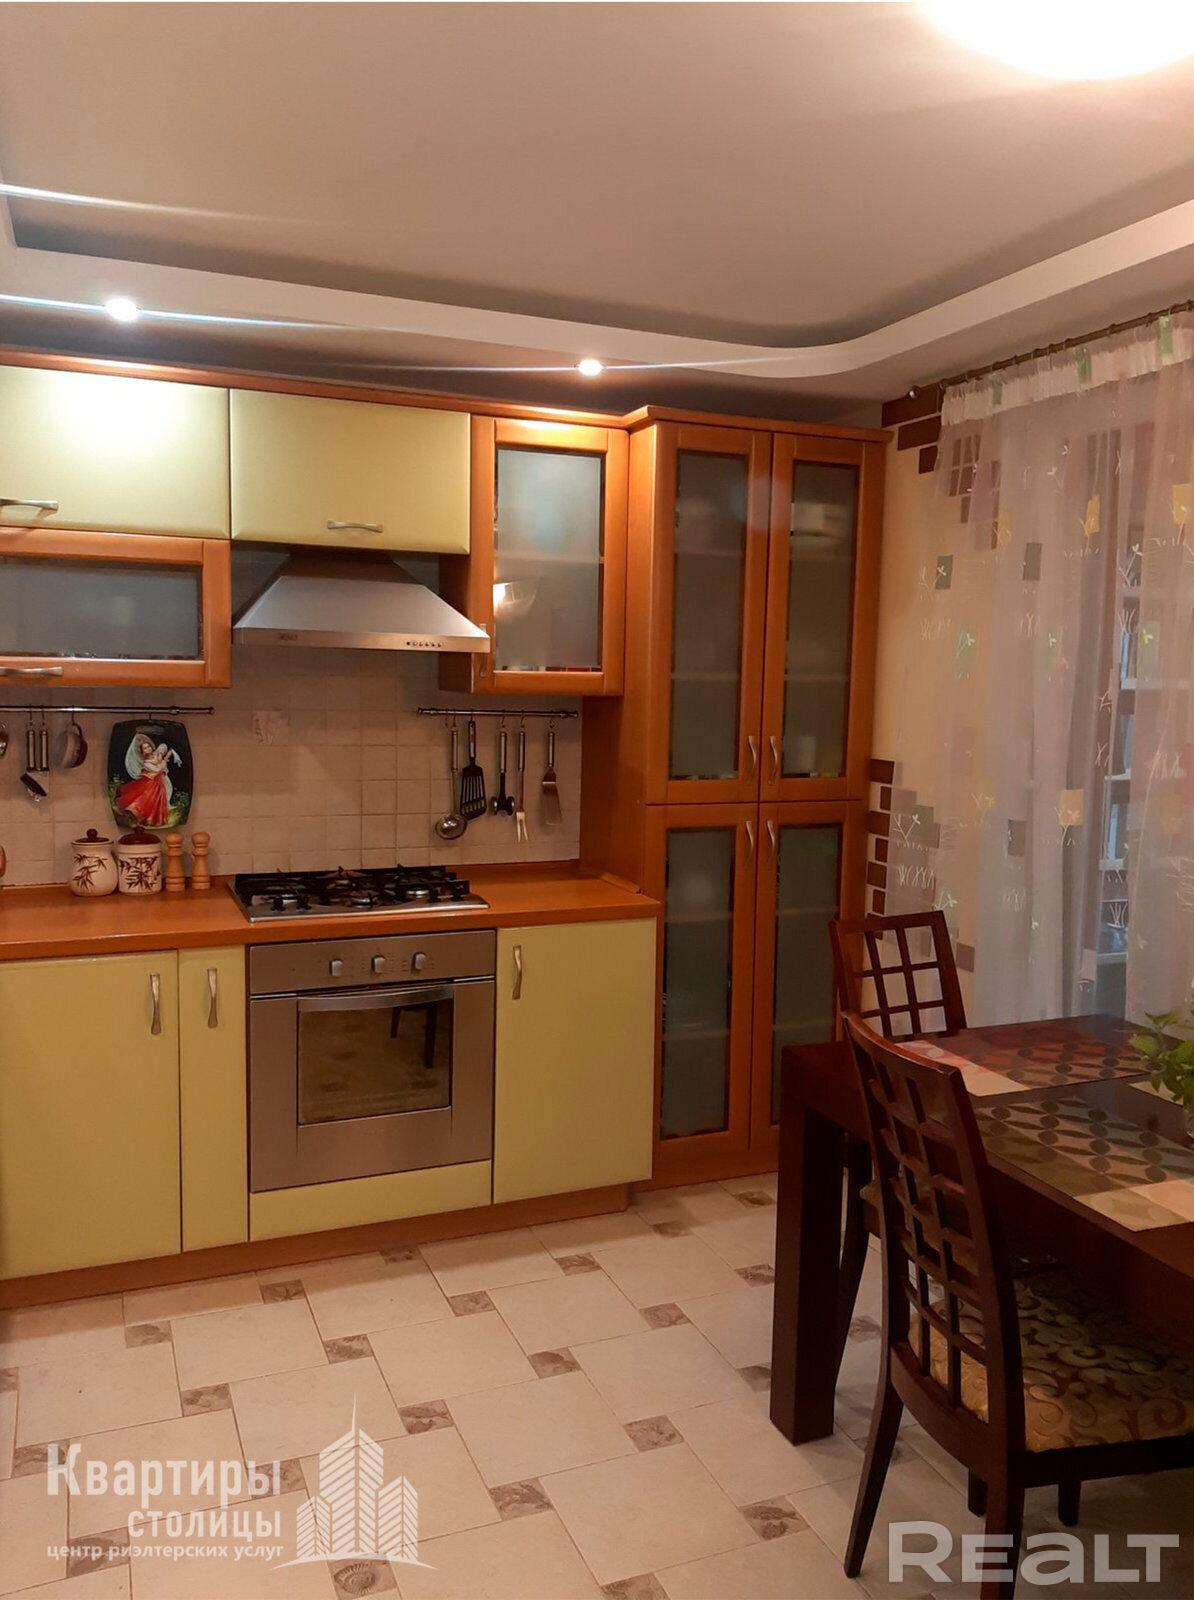 Продажа 3-х комнатной квартиры в г. Минске, ул. Прушинских, дом 18 (р-н Лошица). Цена 220 363 руб